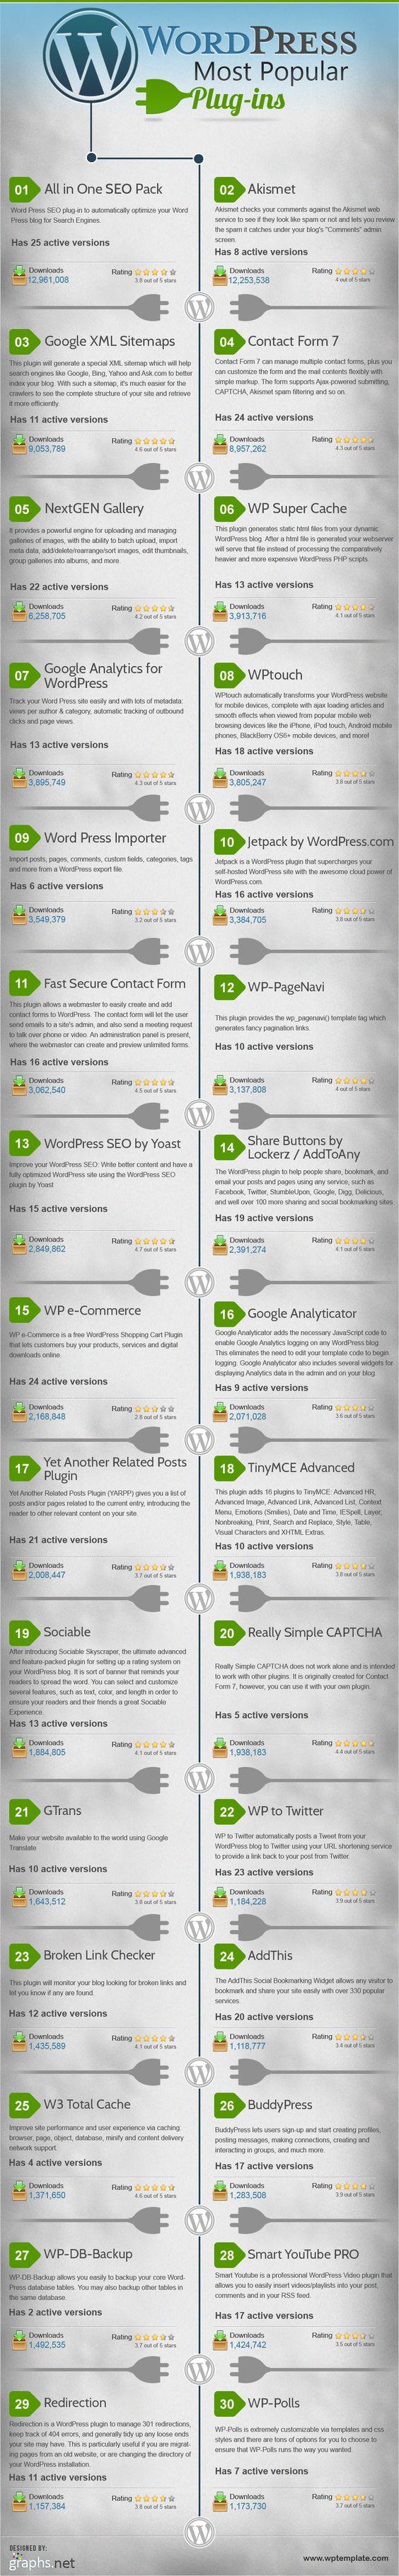 WordPress Most Popular Plugins